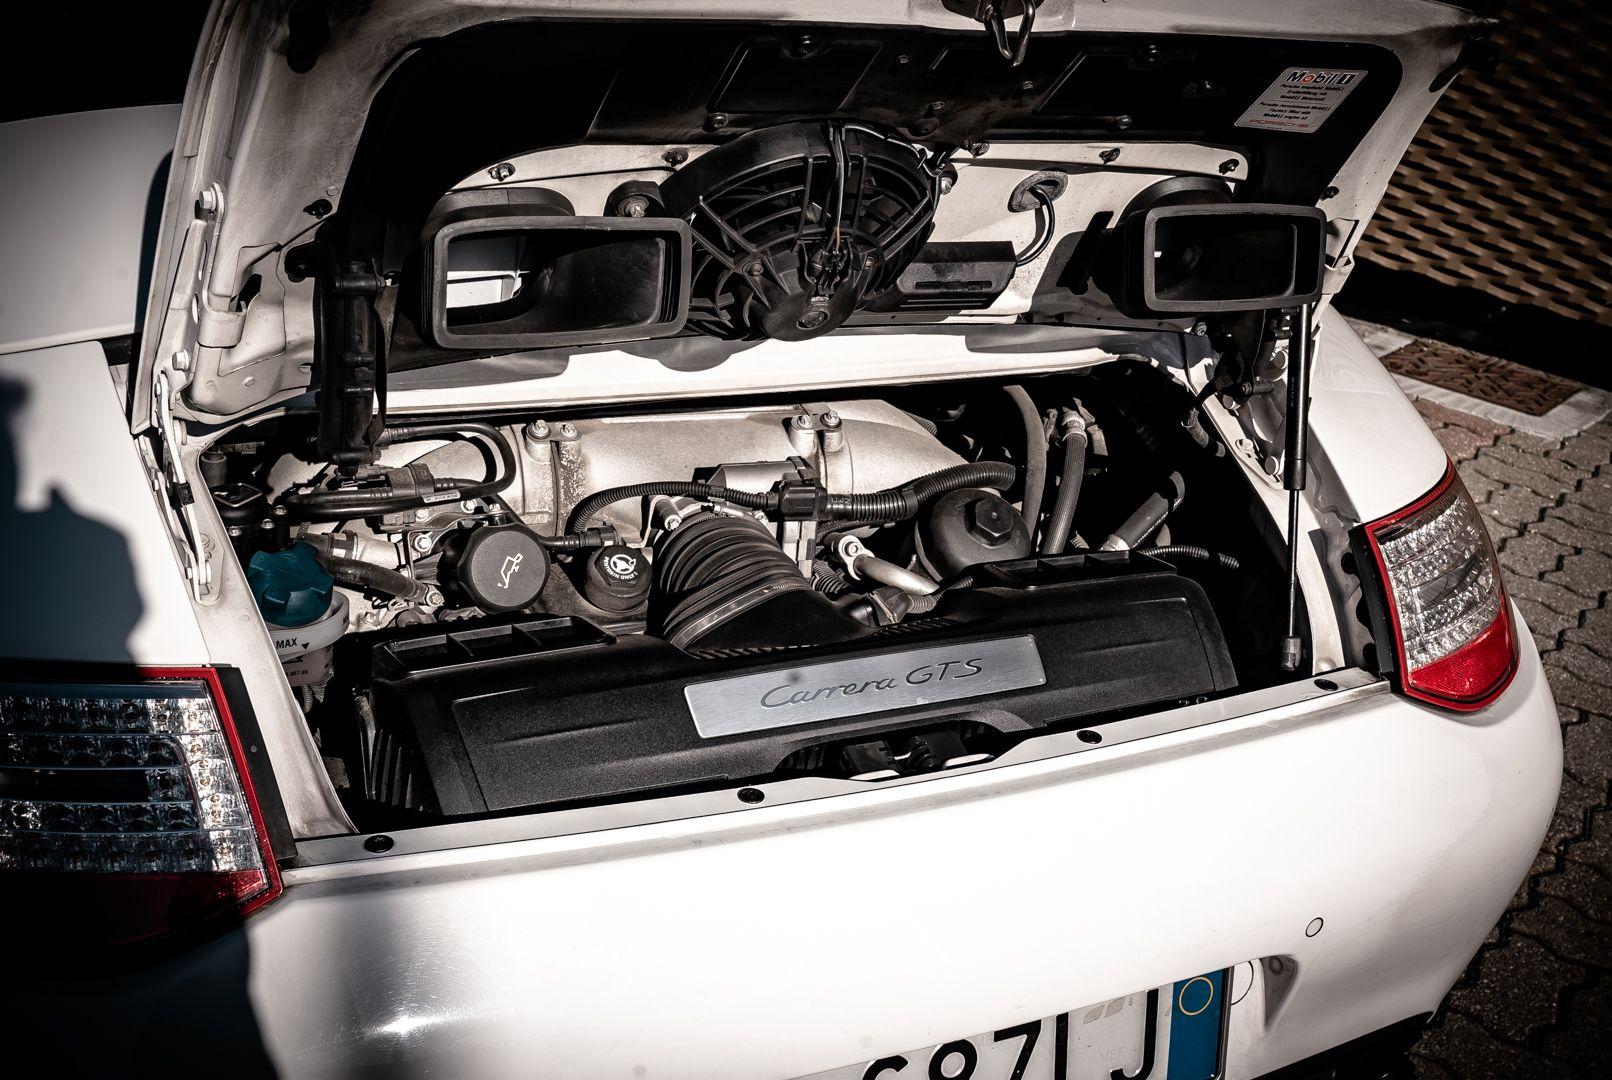 2011 PORSCHE 997 CARRERA GTS 60794